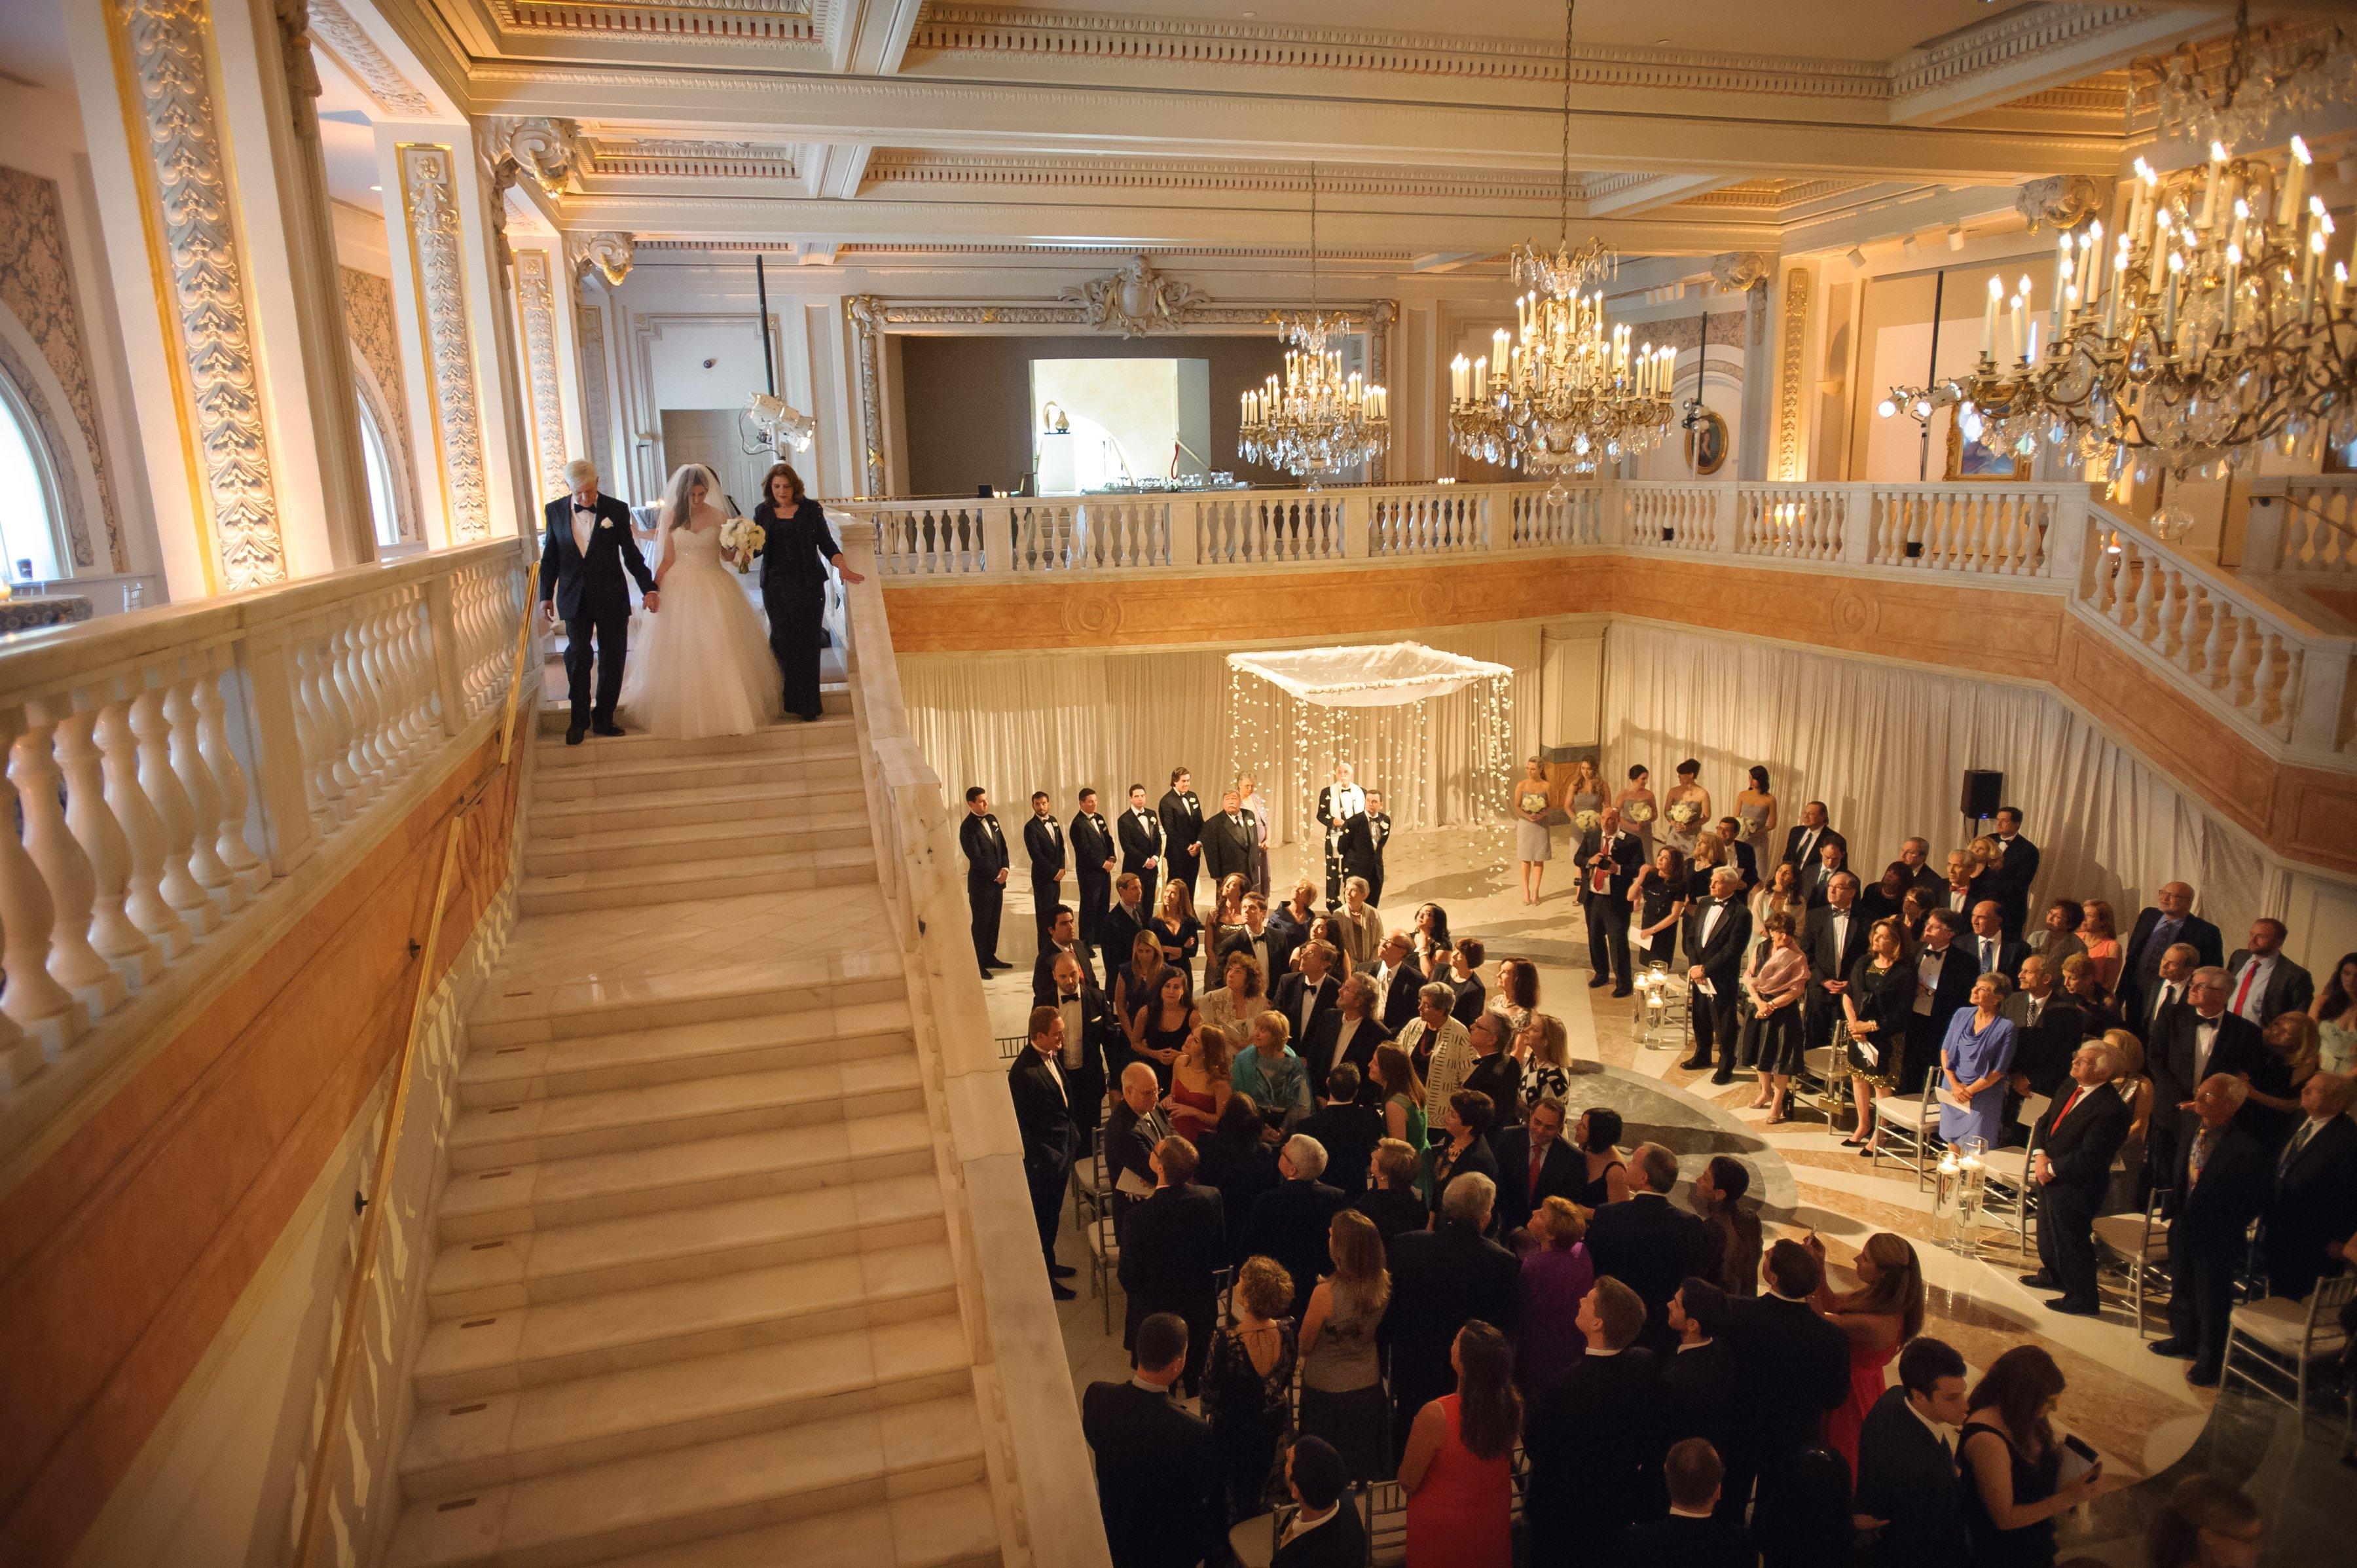 Wedding Rehearsal Planning, DC Wedding Planner Bright Occasions, Photography by Matt Mendelsohn Creative